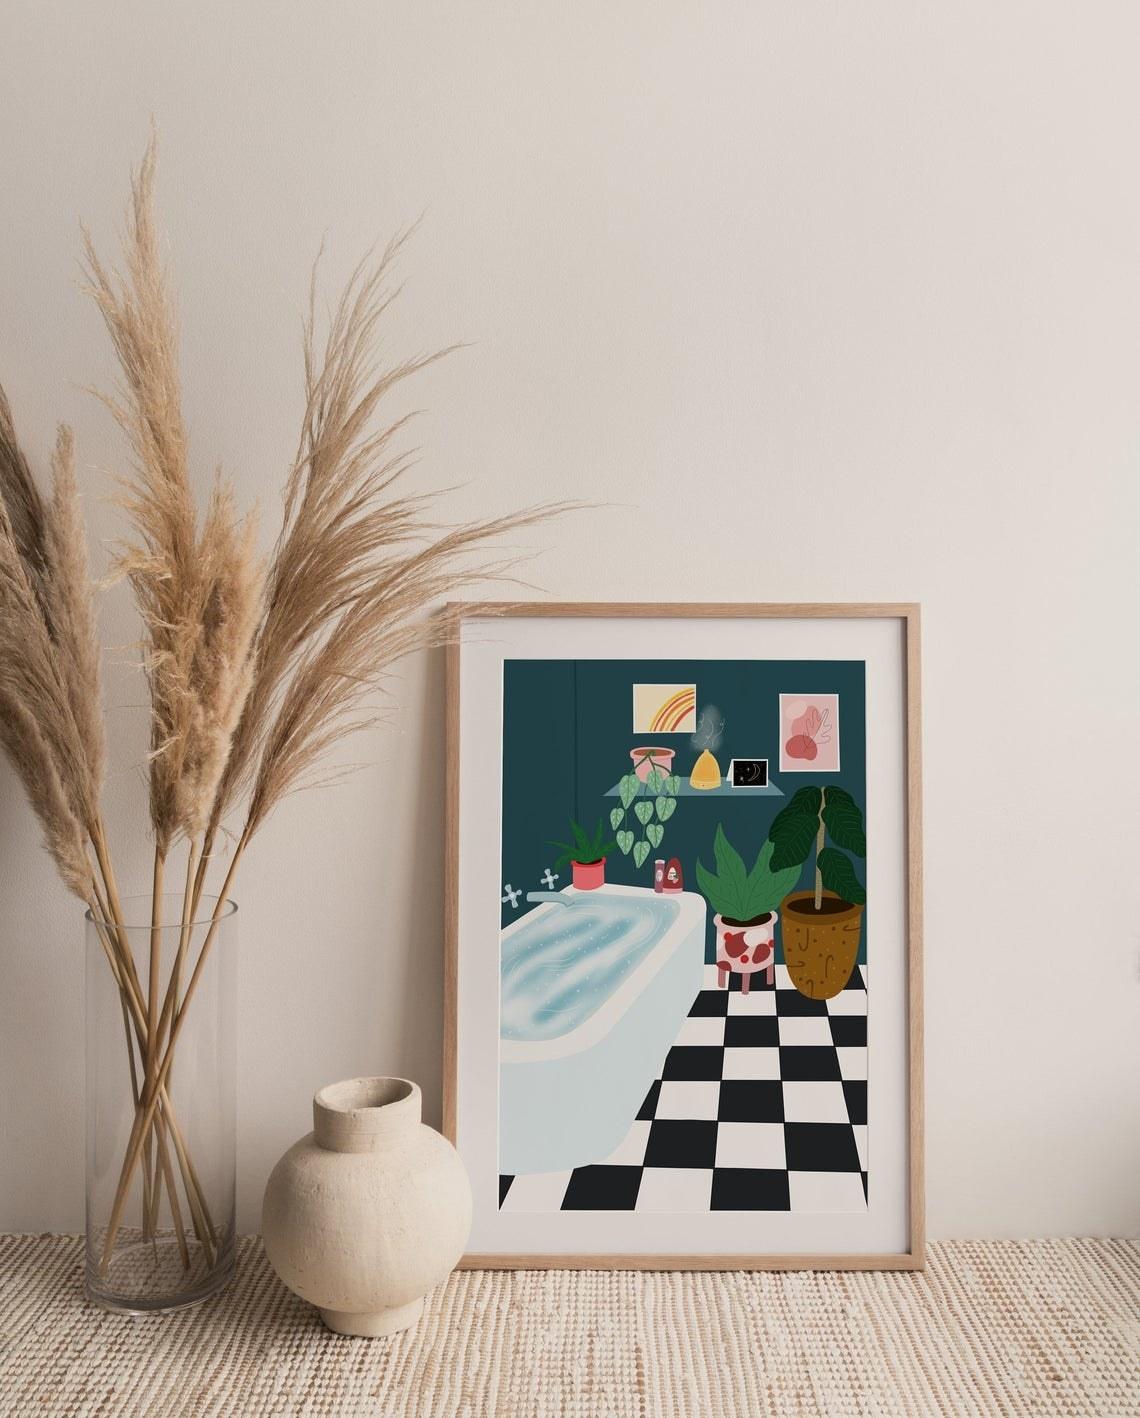 Bathroom illustration with grid tile, plants, and a big bath tub